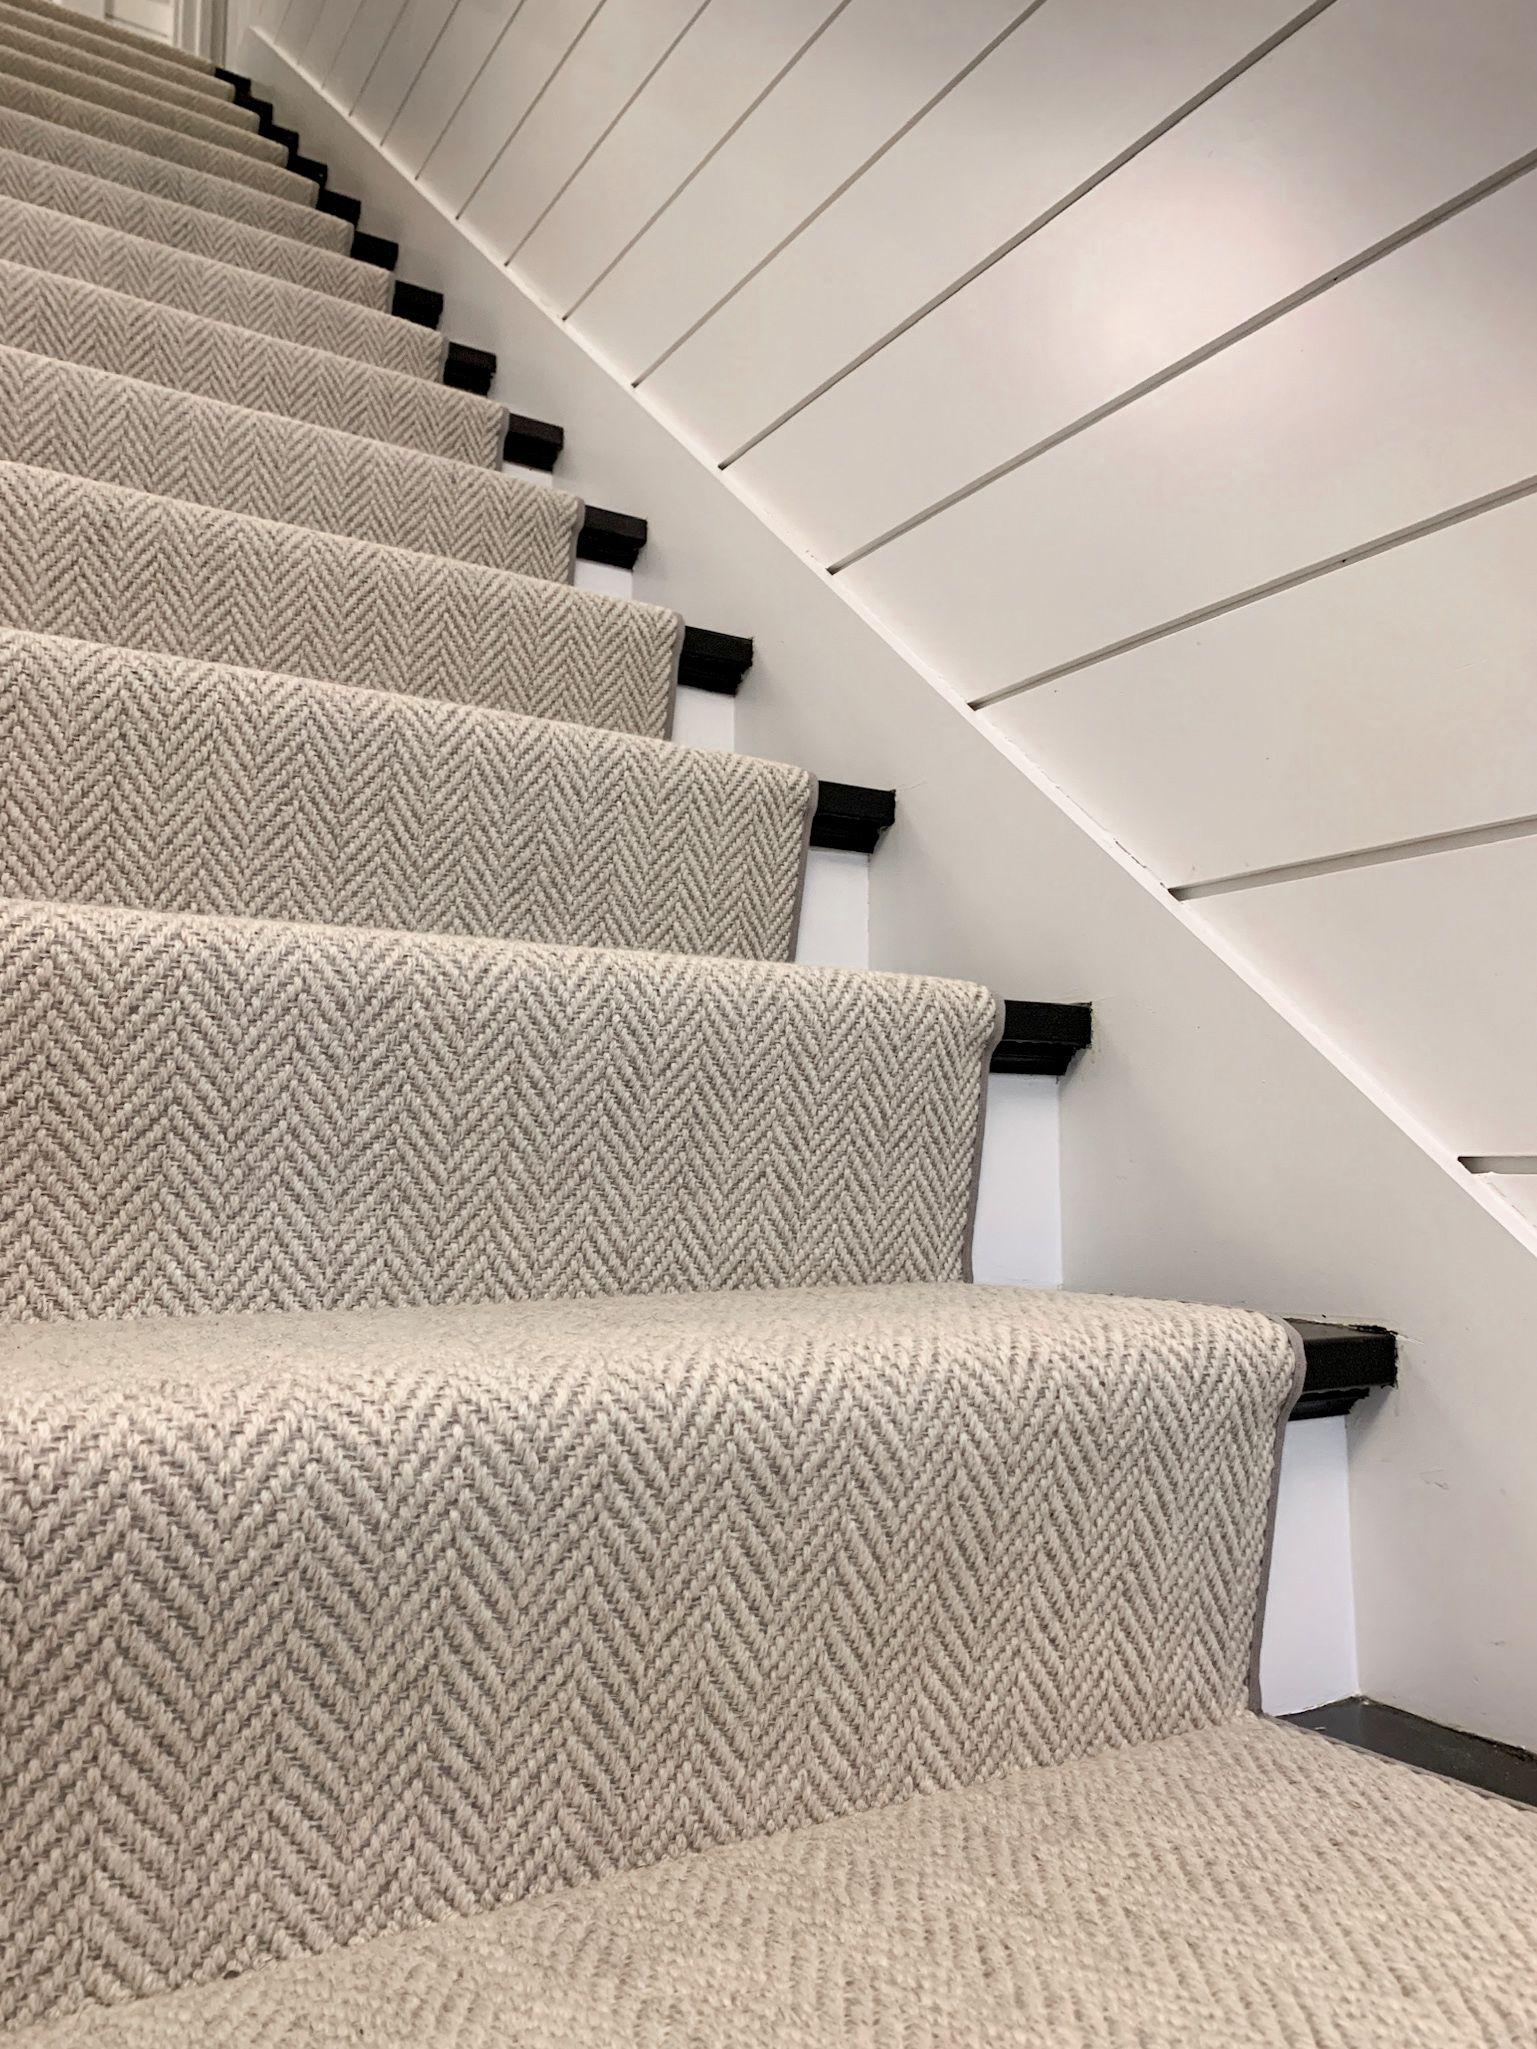 Neutral Herringbone Stair Runner In 2020 Stair Runner Carpet | Grey Herringbone Carpet Stairs | Antelope | Victorian | Middle Stair | Roger Oates | Blue